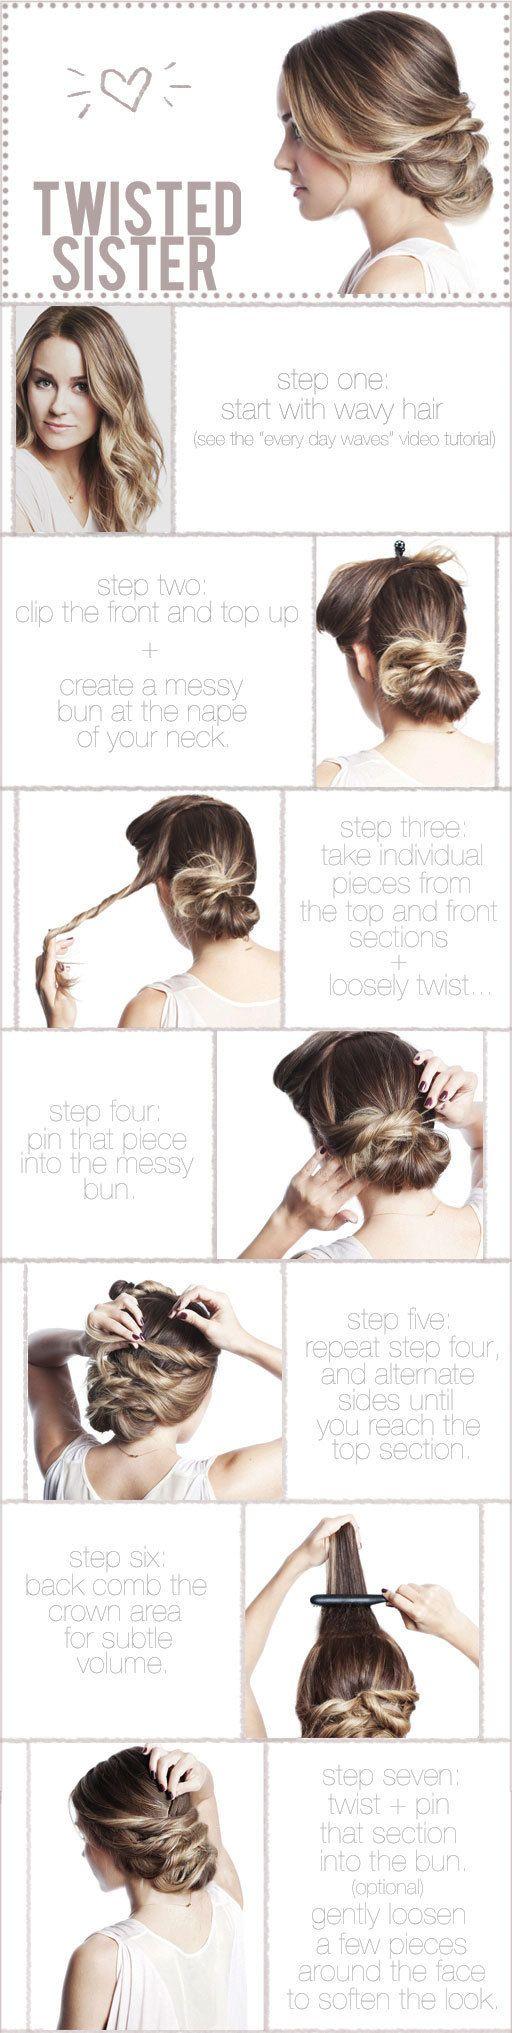 three fav pre wedding DIY bridal hairstyles how to tutorials for ...